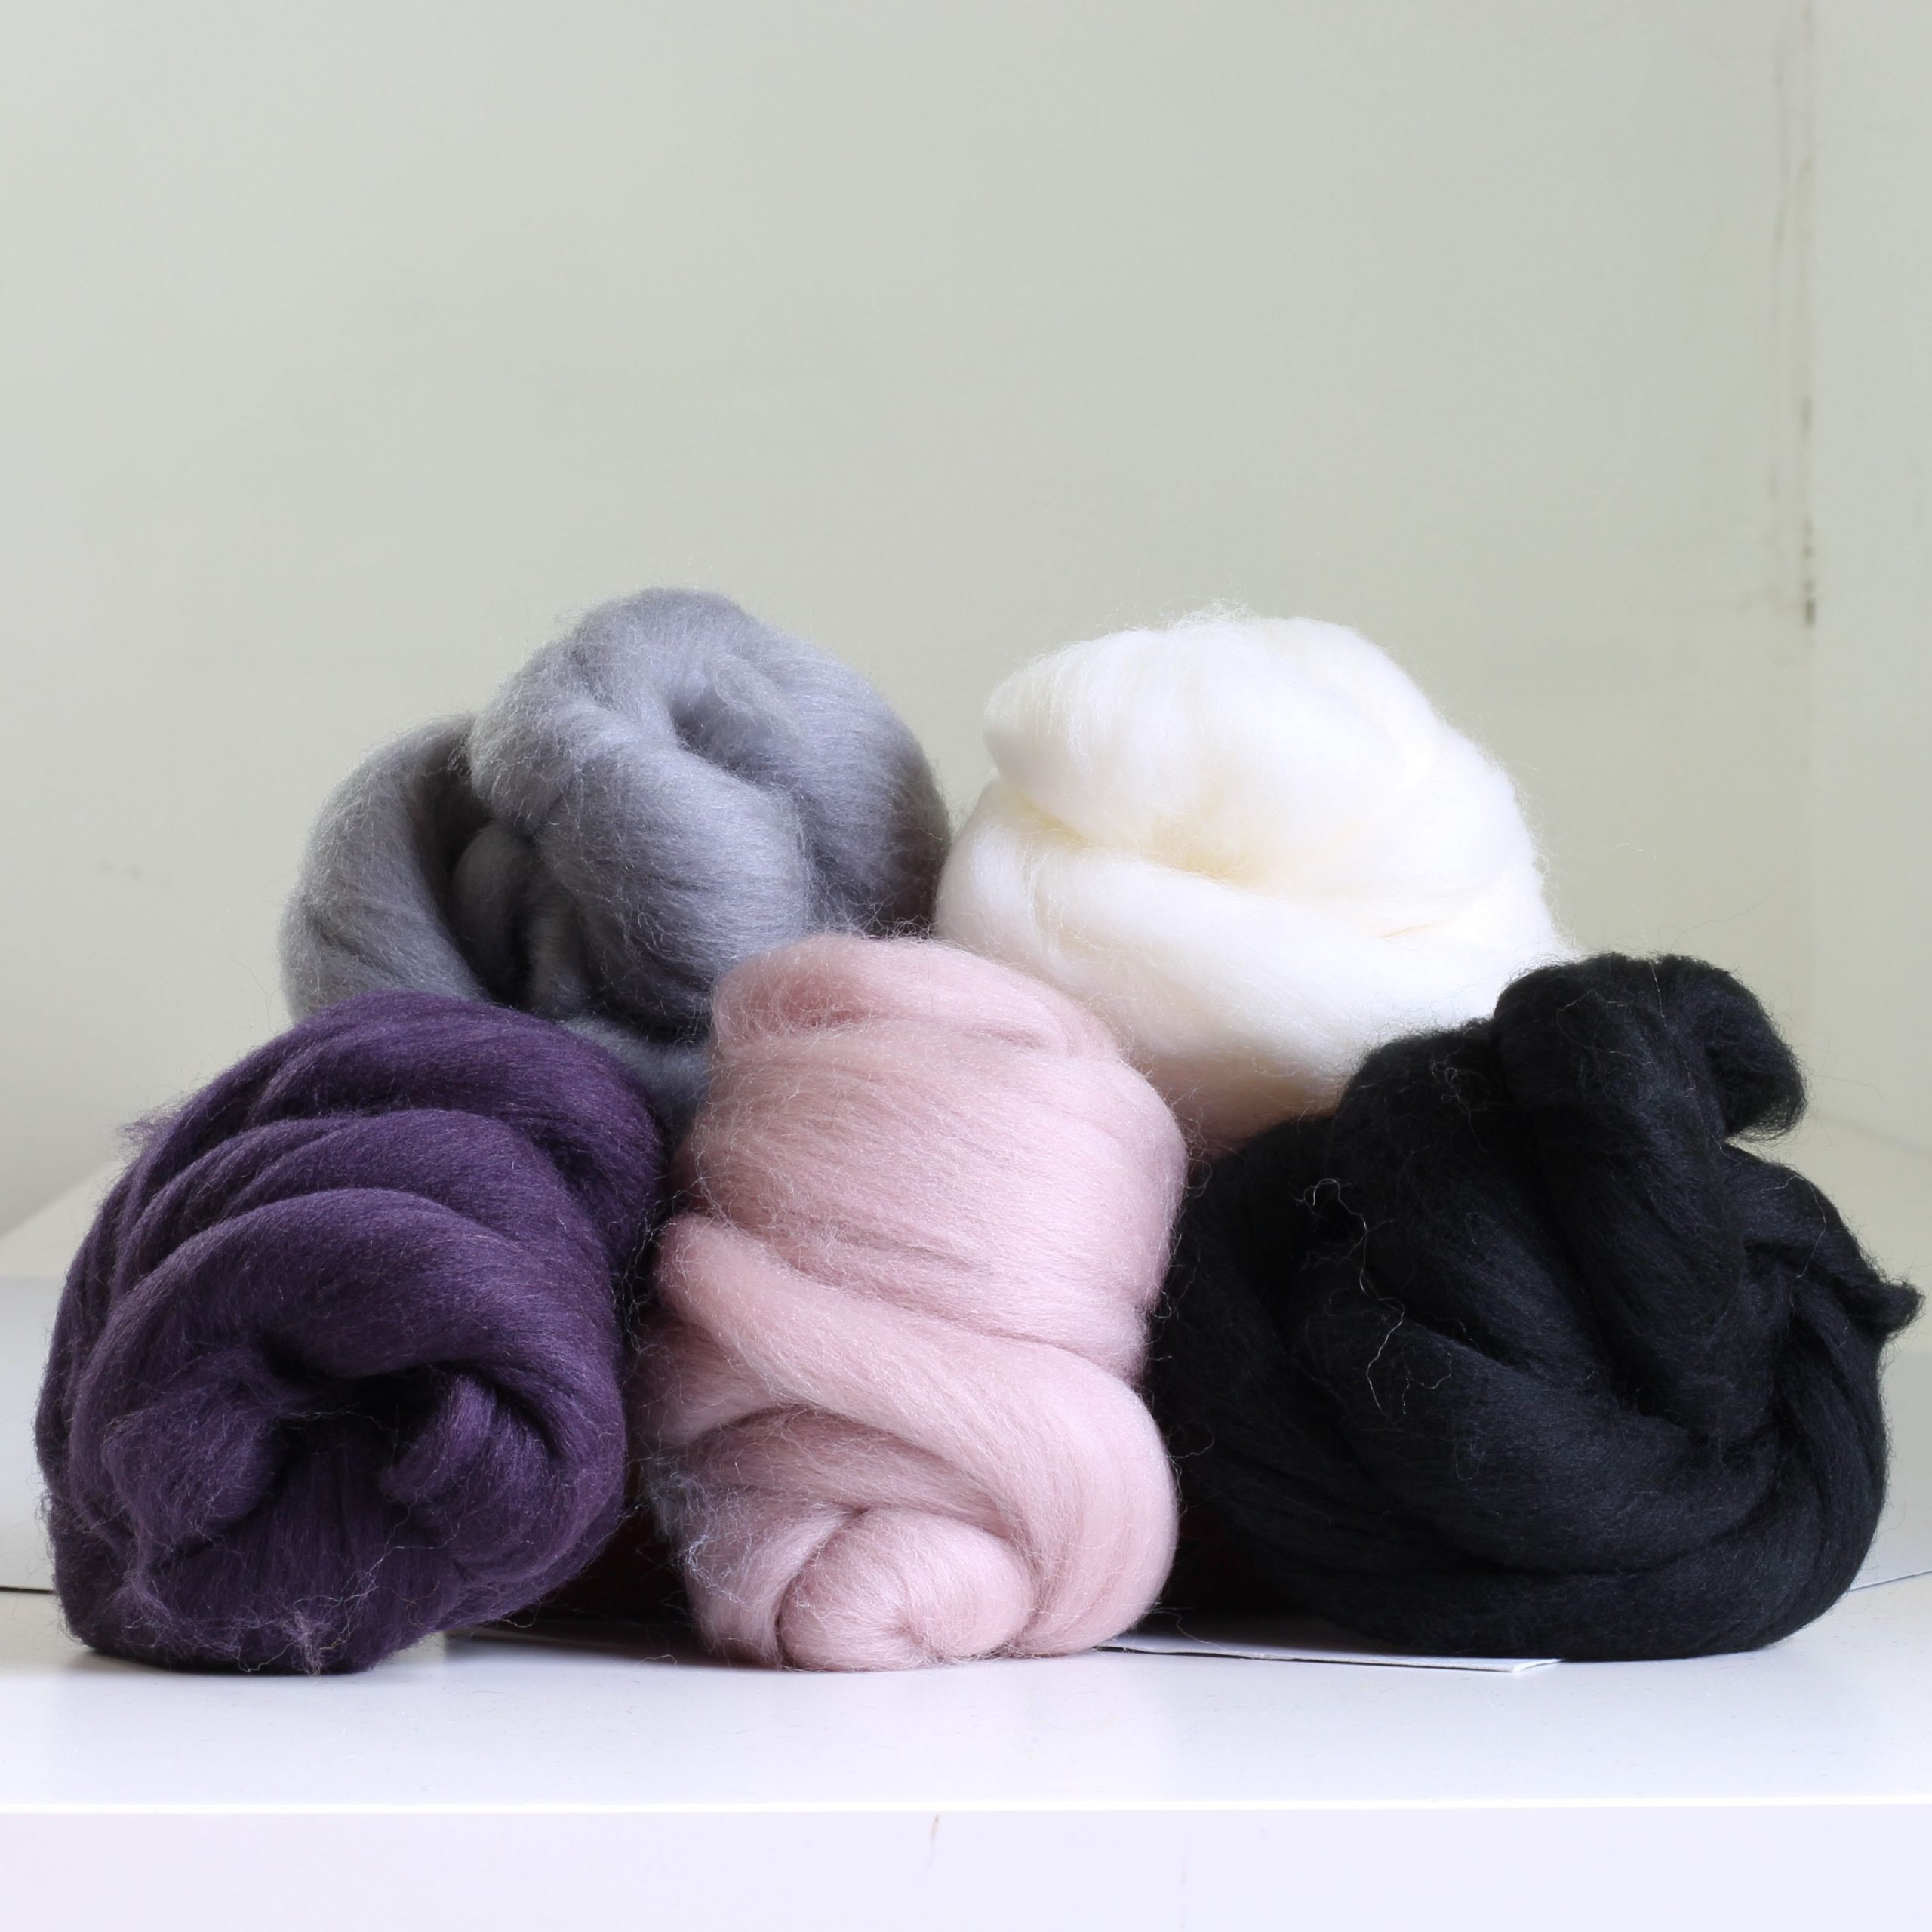 Hawthorn Handmade Merino Wool - Winter needle felting